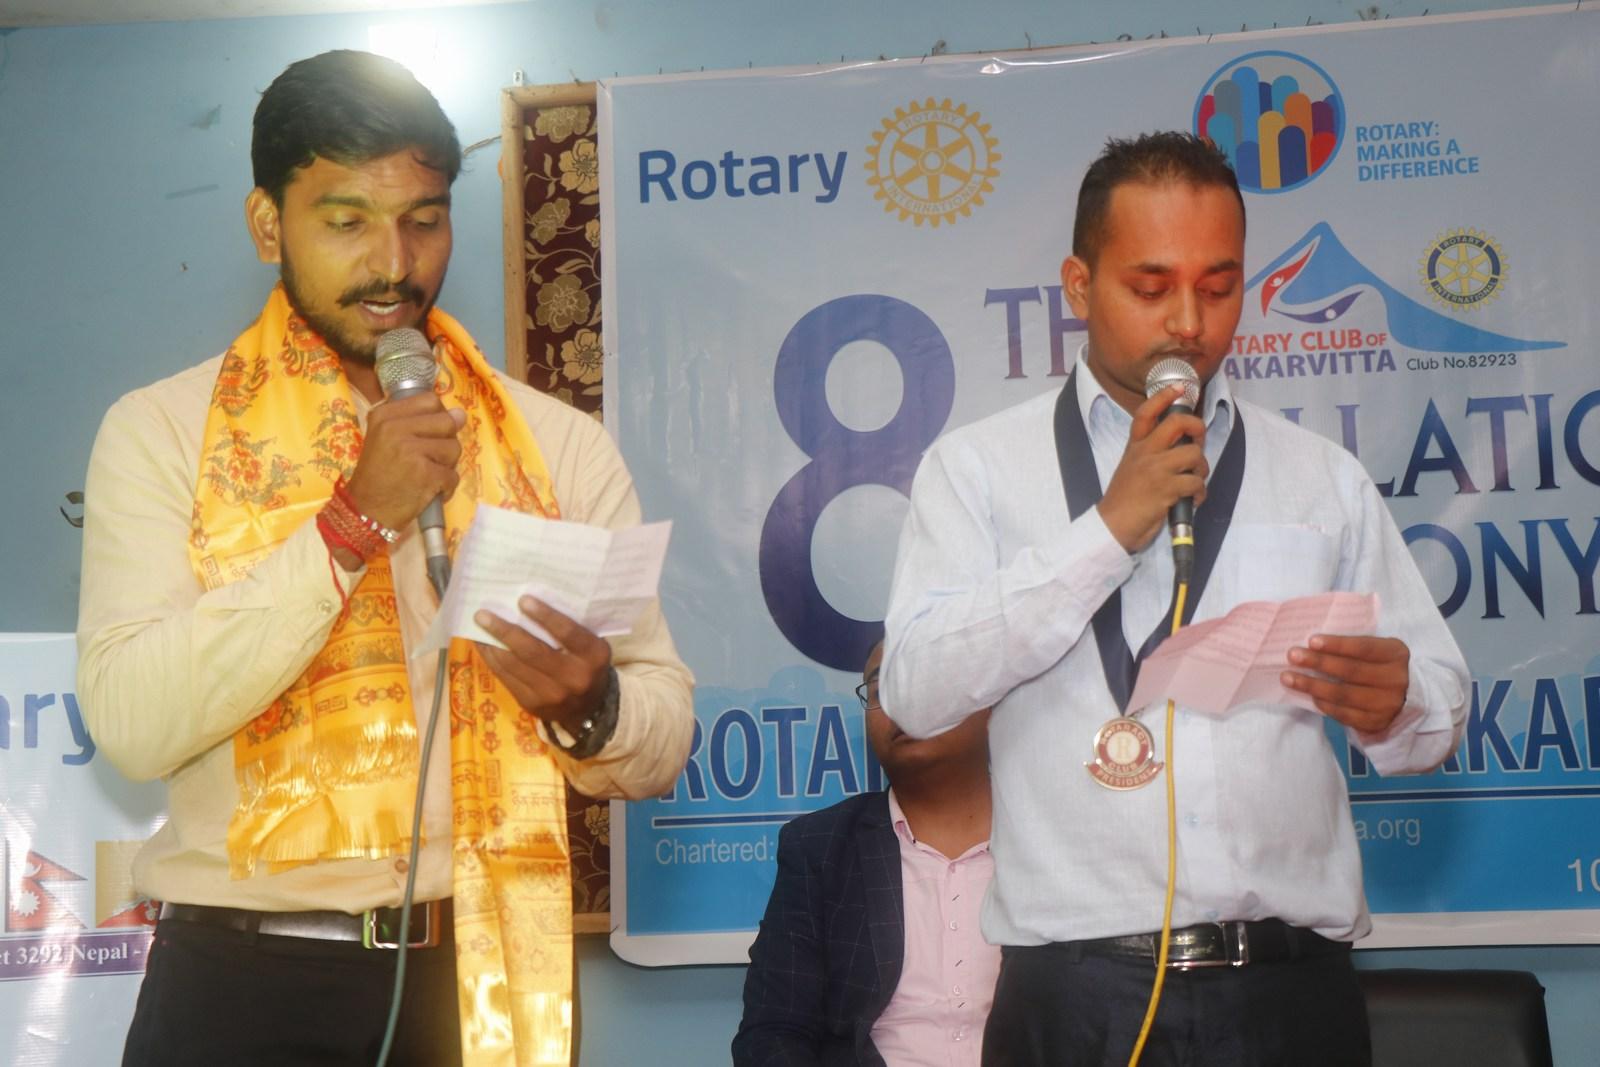 8th-Installation-Ceremony-Rotary-Club-of-Kakarvitta-61